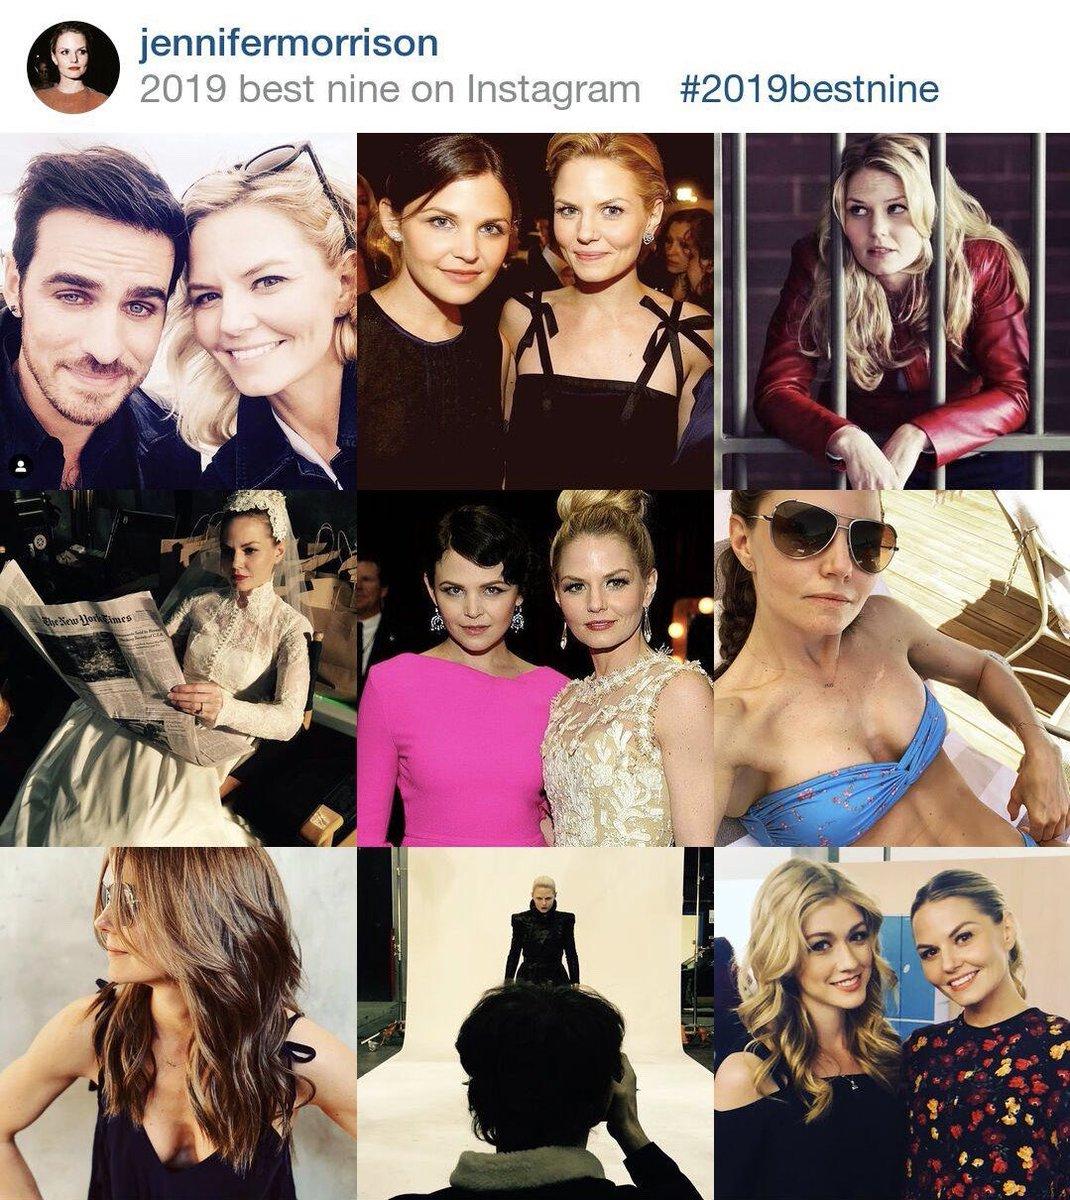 As we round off 2019 here is @jenmorrisonlive's #2019BestNine on instagram & for those who like to reminisce we have Jen's #2018BestNine #2017BestNine & #2016BestNine too   #JenniferMorrison #BestOf2019  #BestOfJMo #JMopic.twitter.com/GDPwHqxdZF